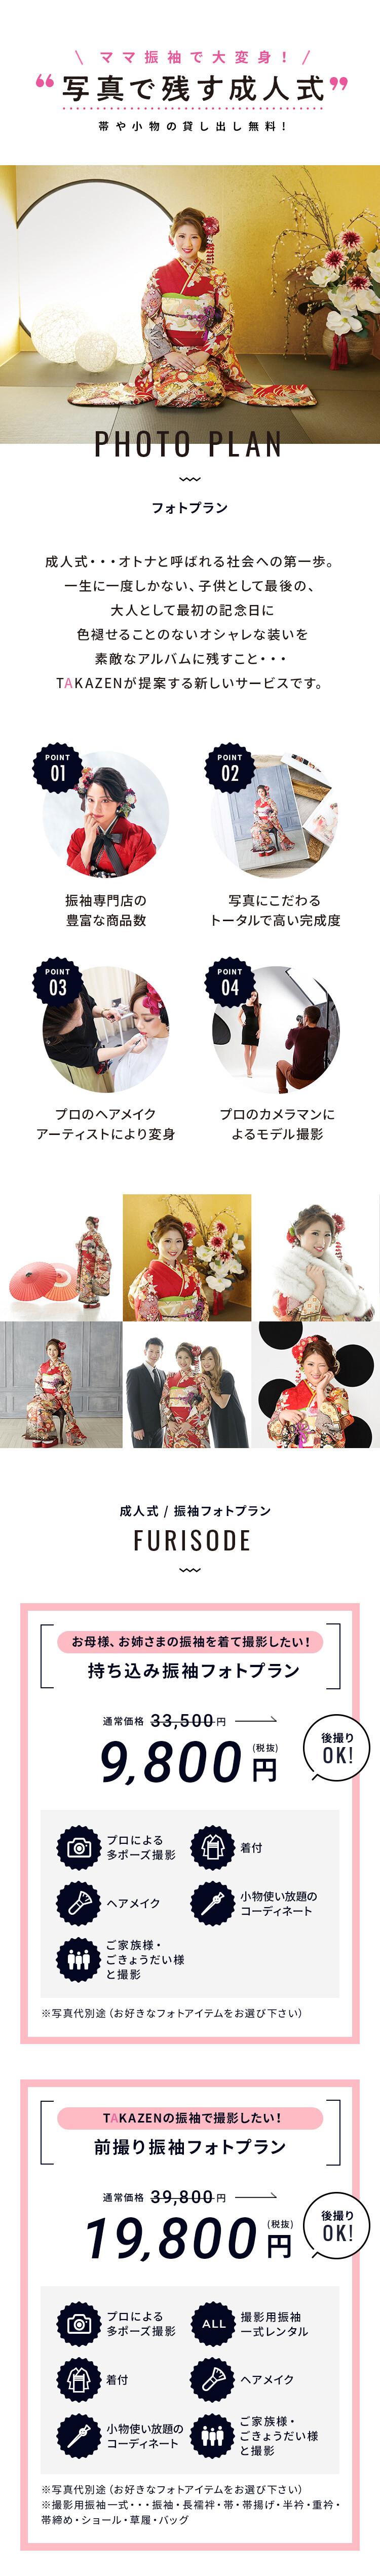 photoplan_01_photo